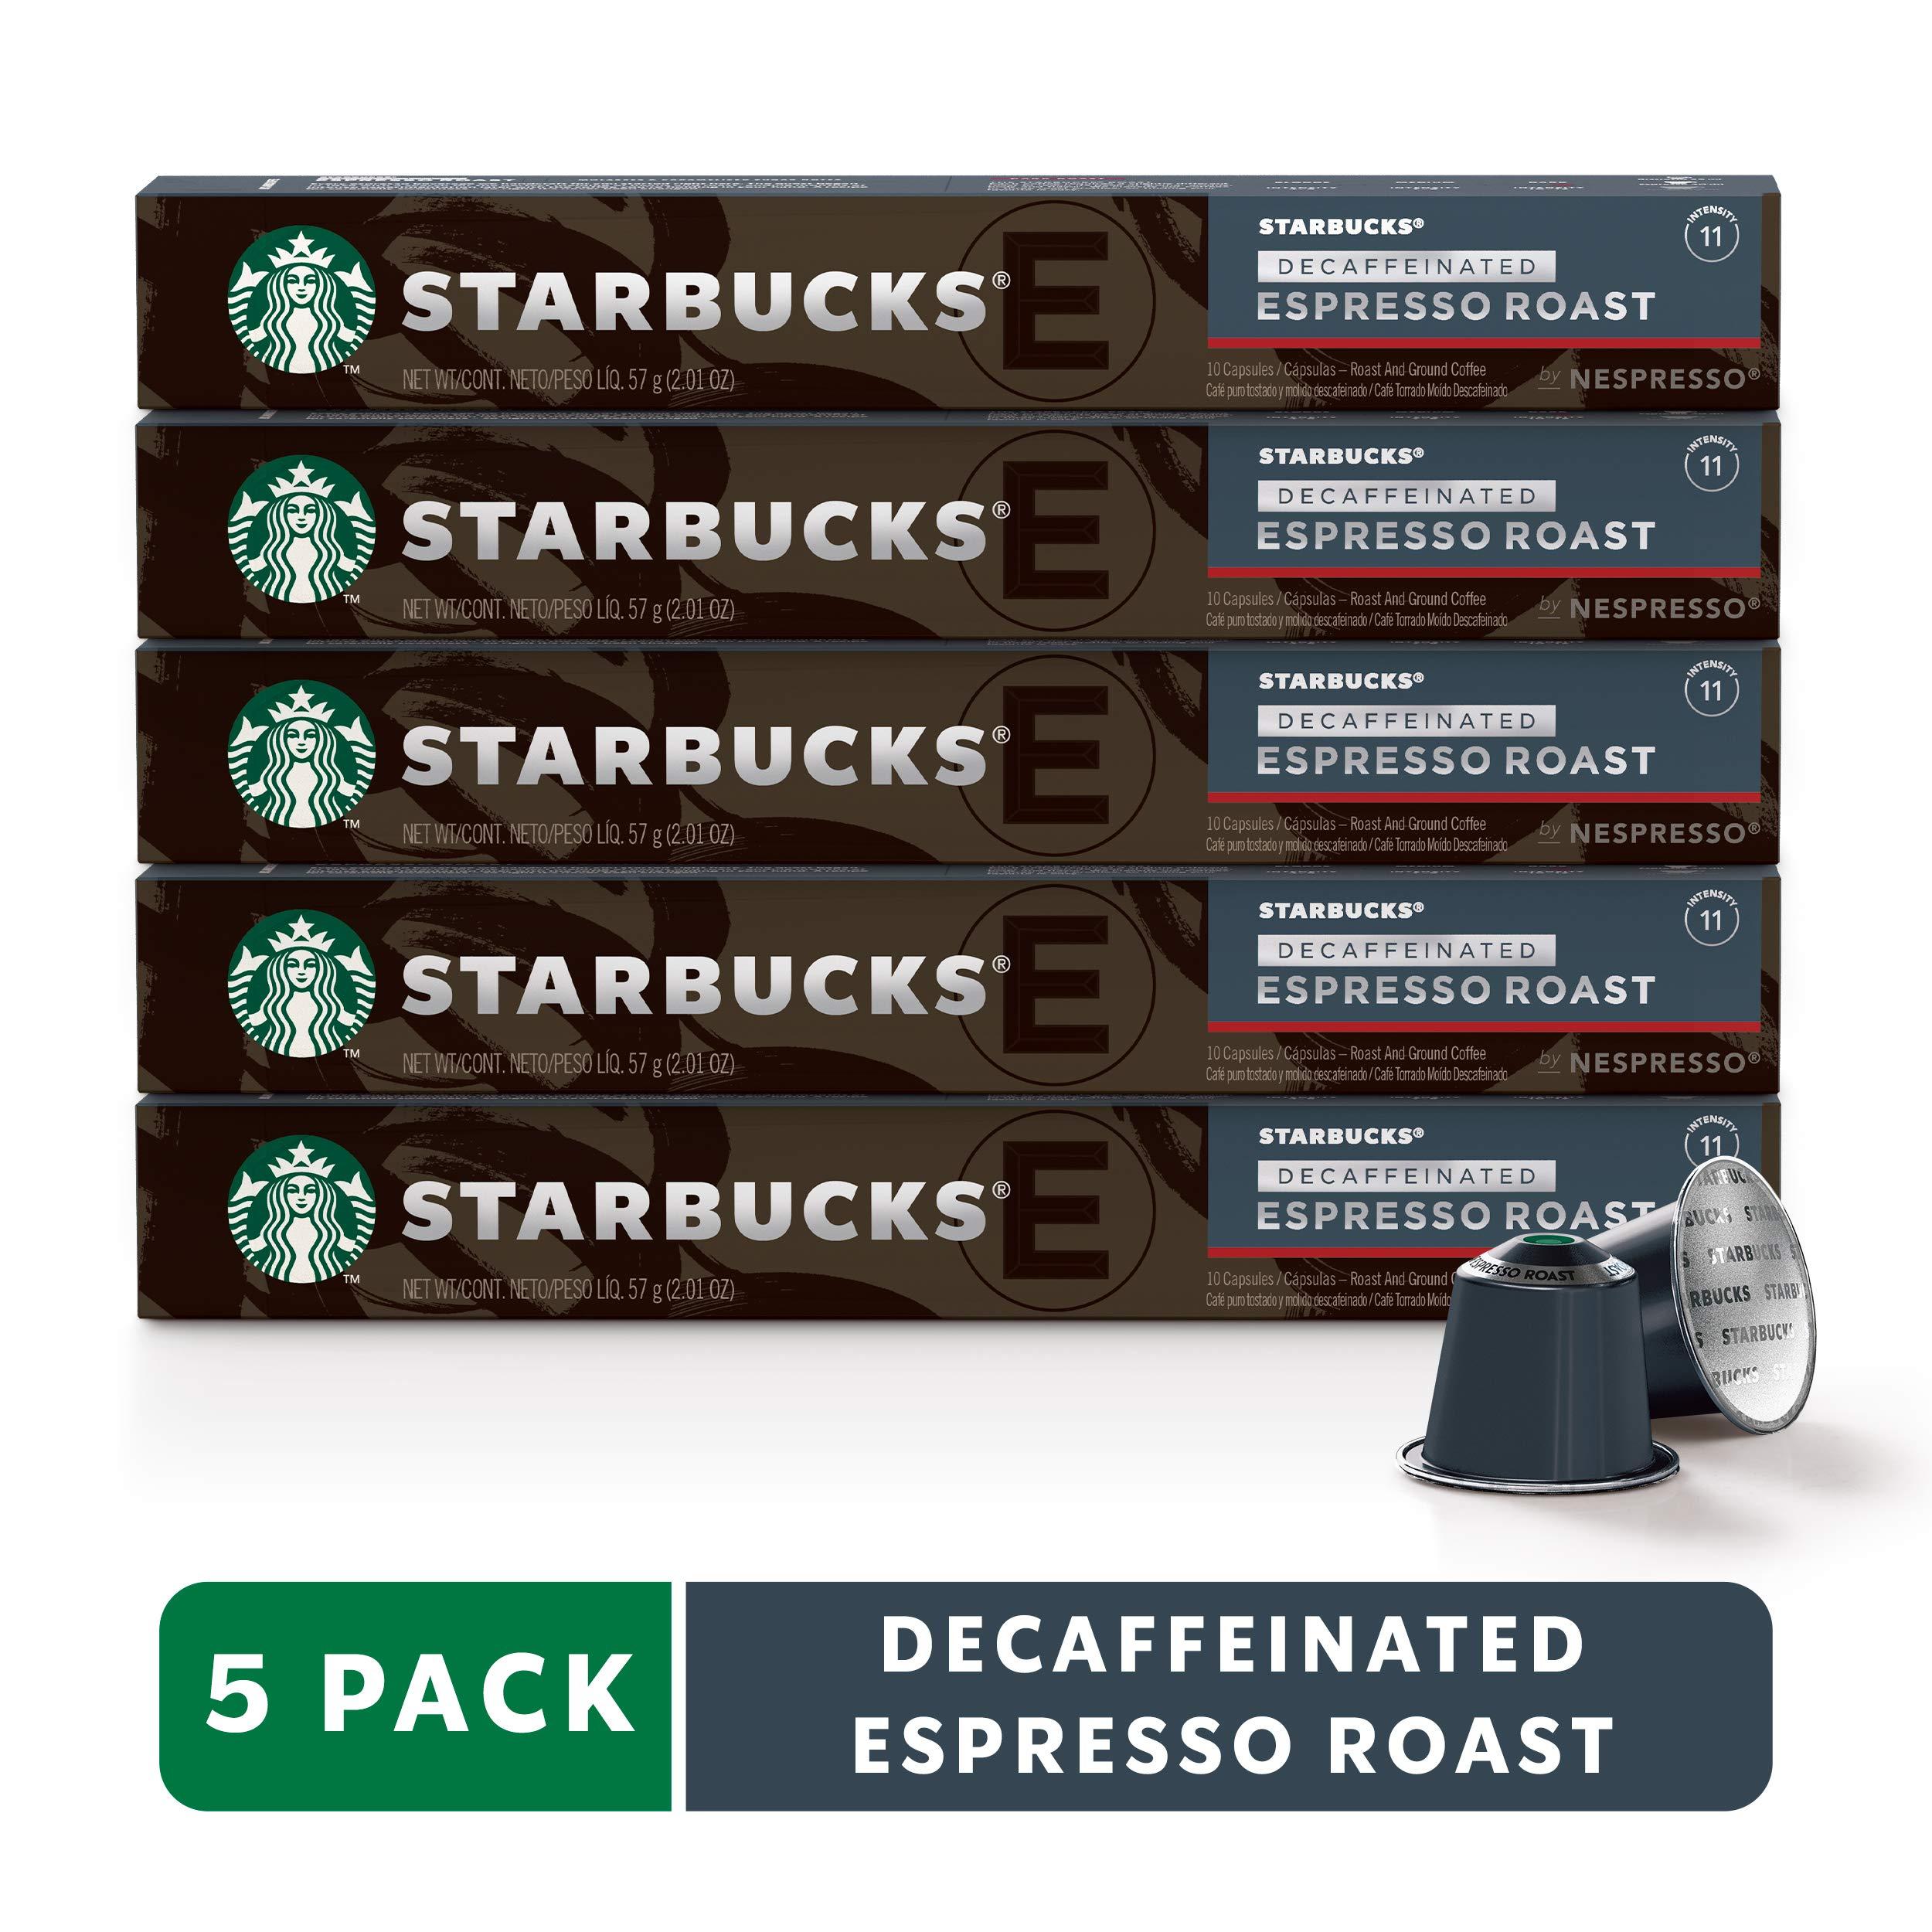 Starbucks by Nespresso, Decaf Espresso Dark Roast (50-count single serve capsules, compatible with Nespresso Original Line System) by Starbucks for Nespresso (Image #1)